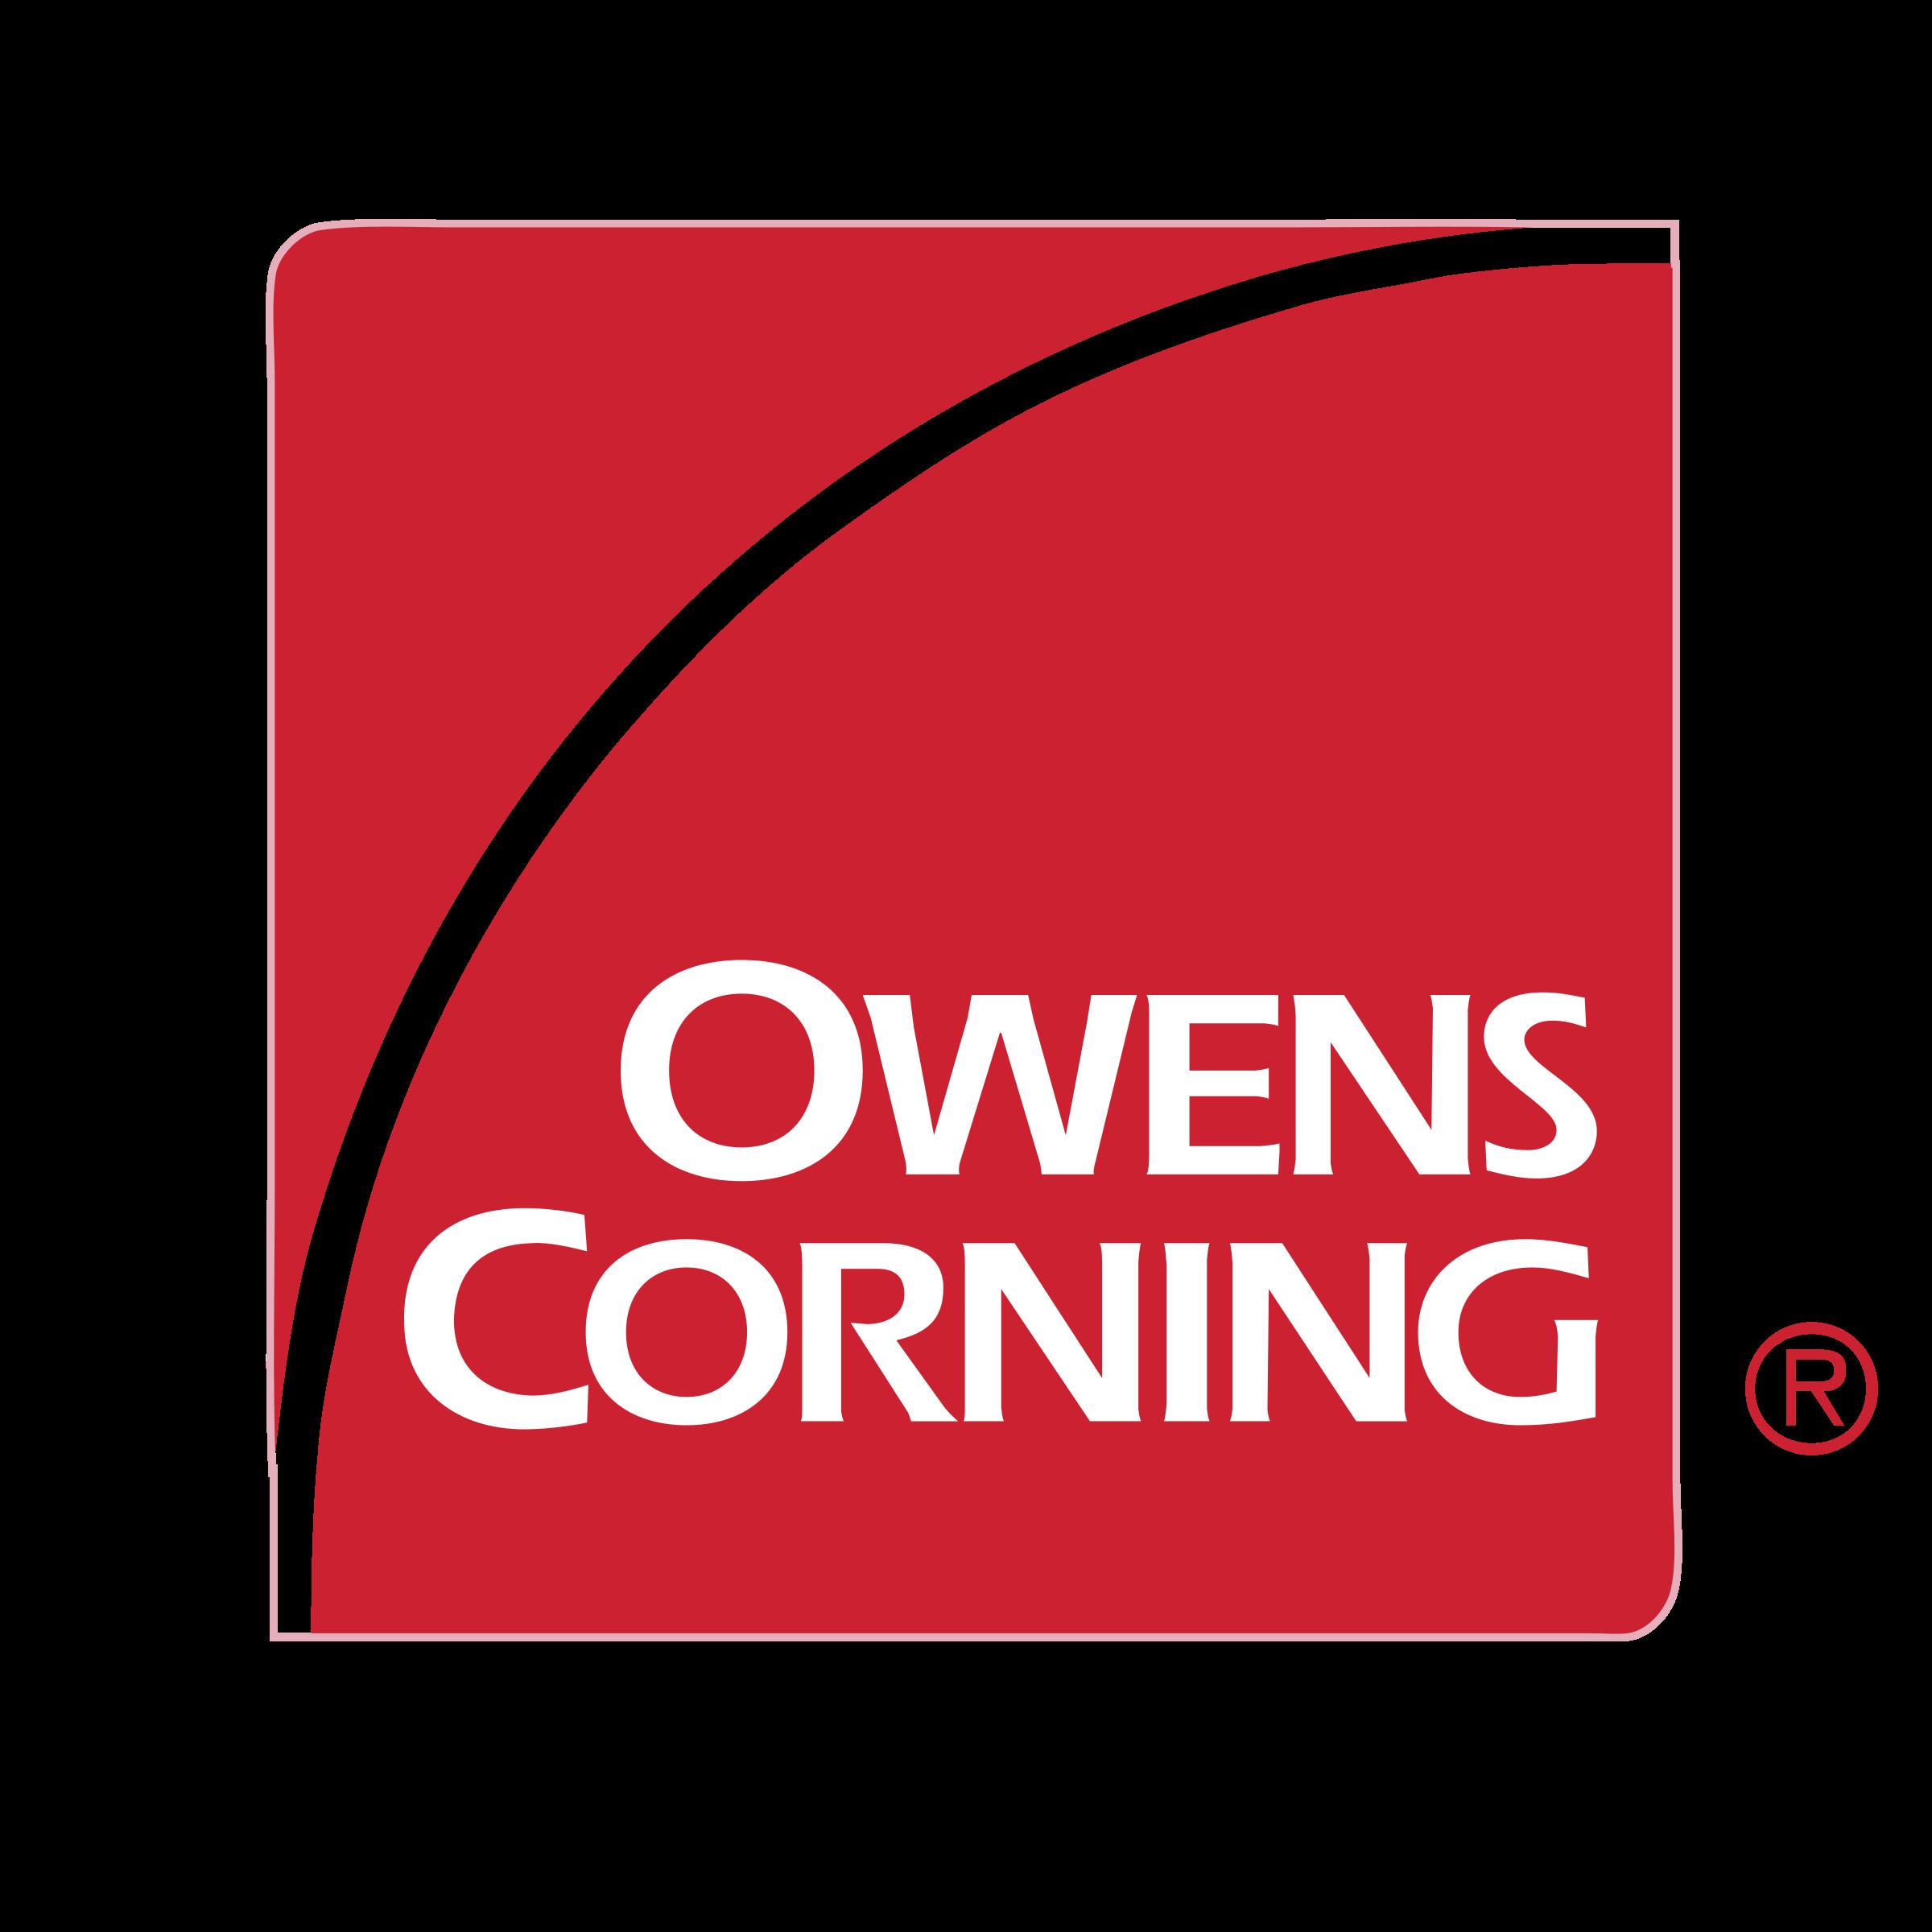 owens-corning-logo-png-transparent